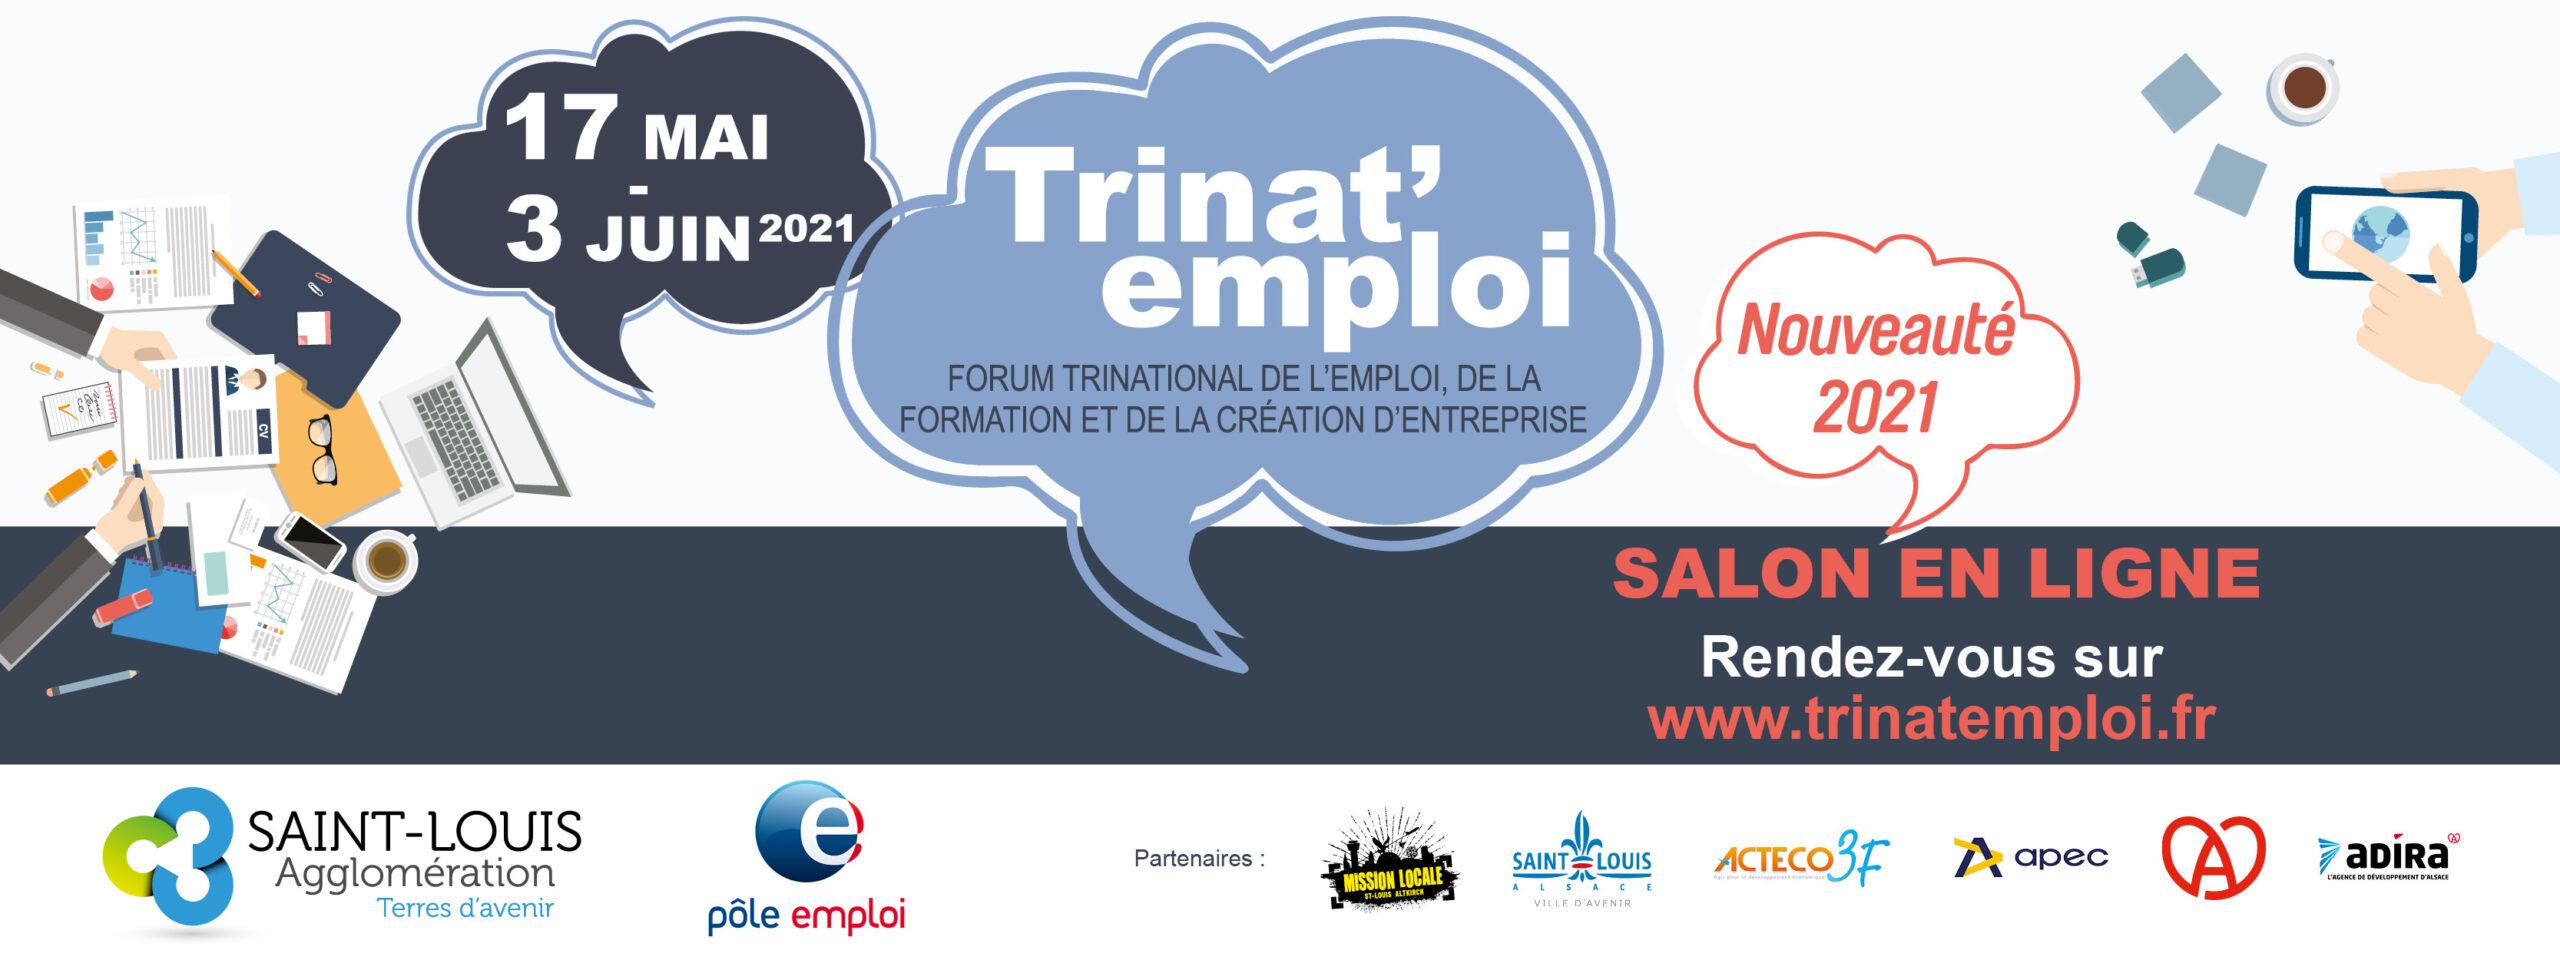 trinatemploi-saint-louis-visuel-cover